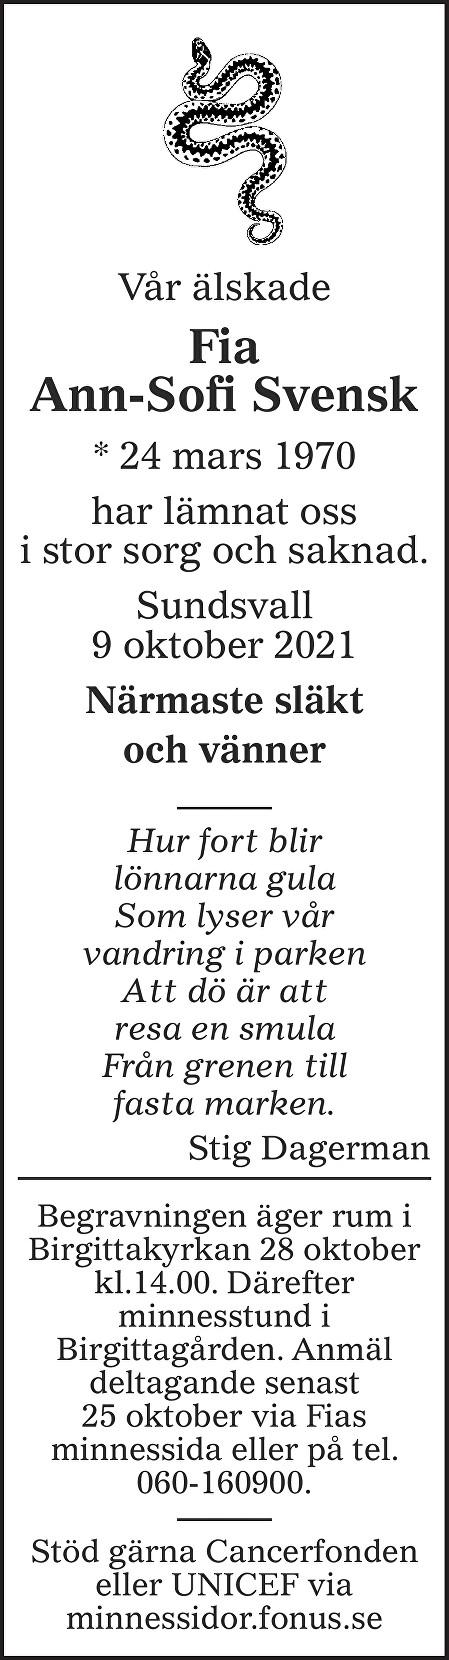 Fia Ann-Sofi Svensk Death notice